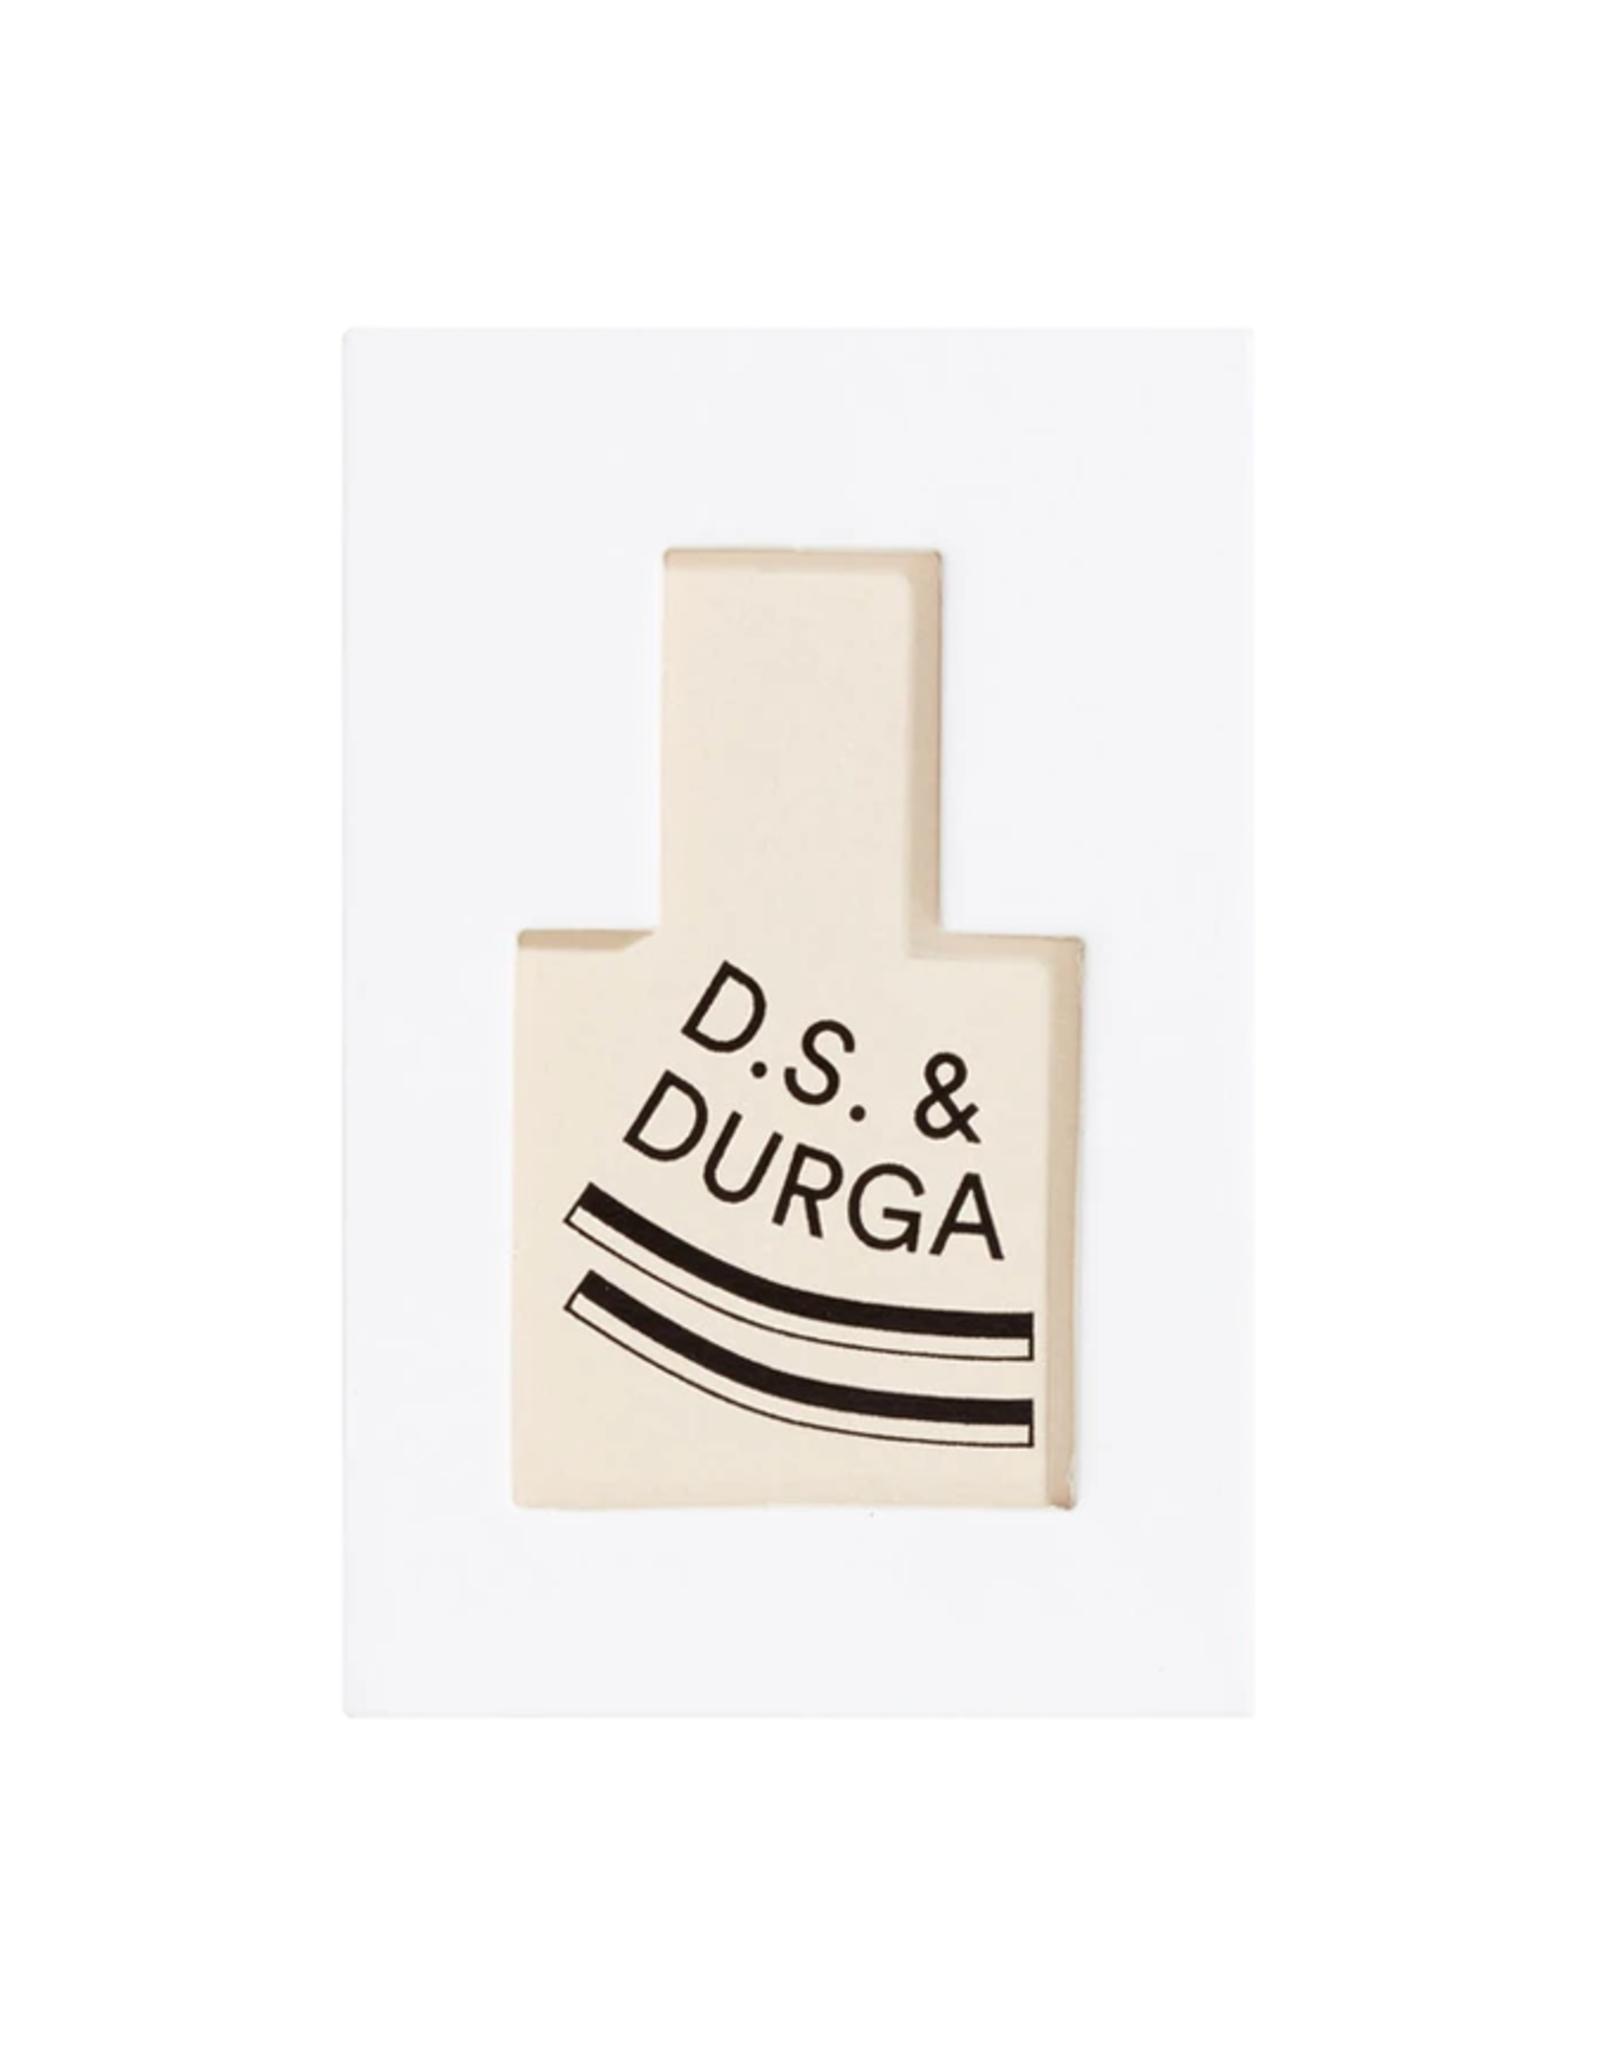 D.S. & DURGA Burning Barbershop - Eau de Parfum - 50mL